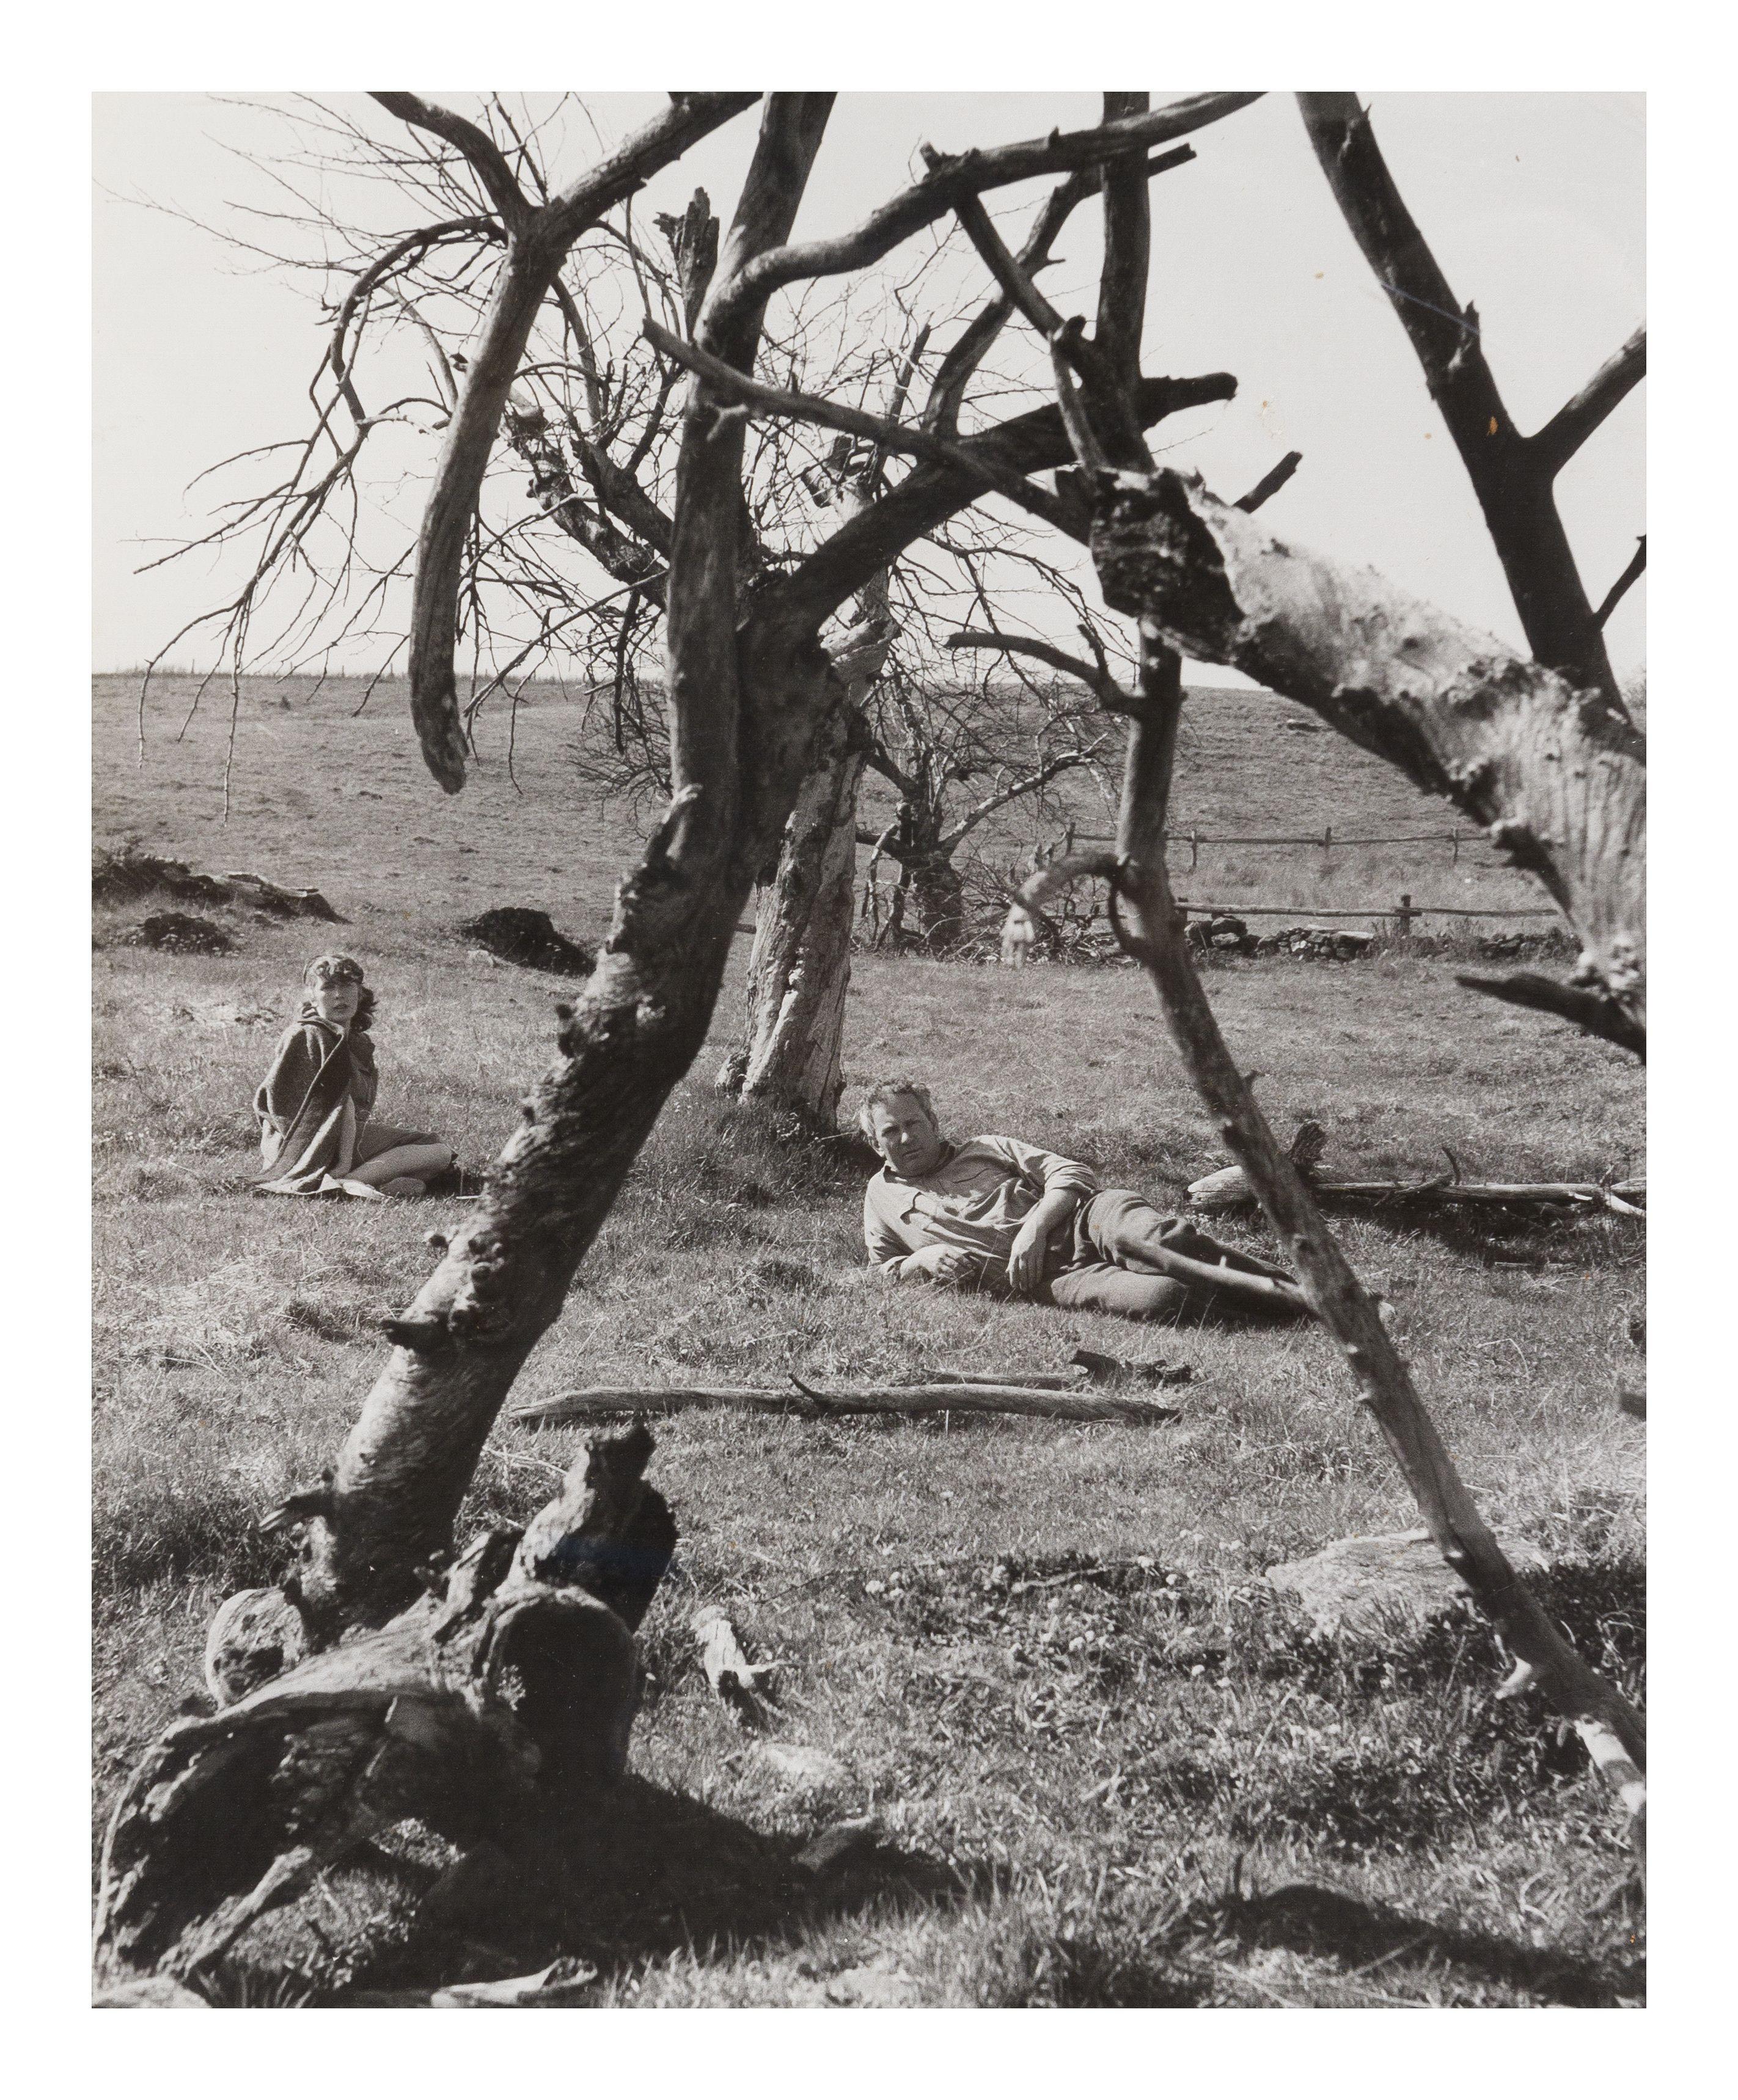 Herbert Matter, (American/Swiss, 1907-1984) | Alexander Calder and Louisa, 1940